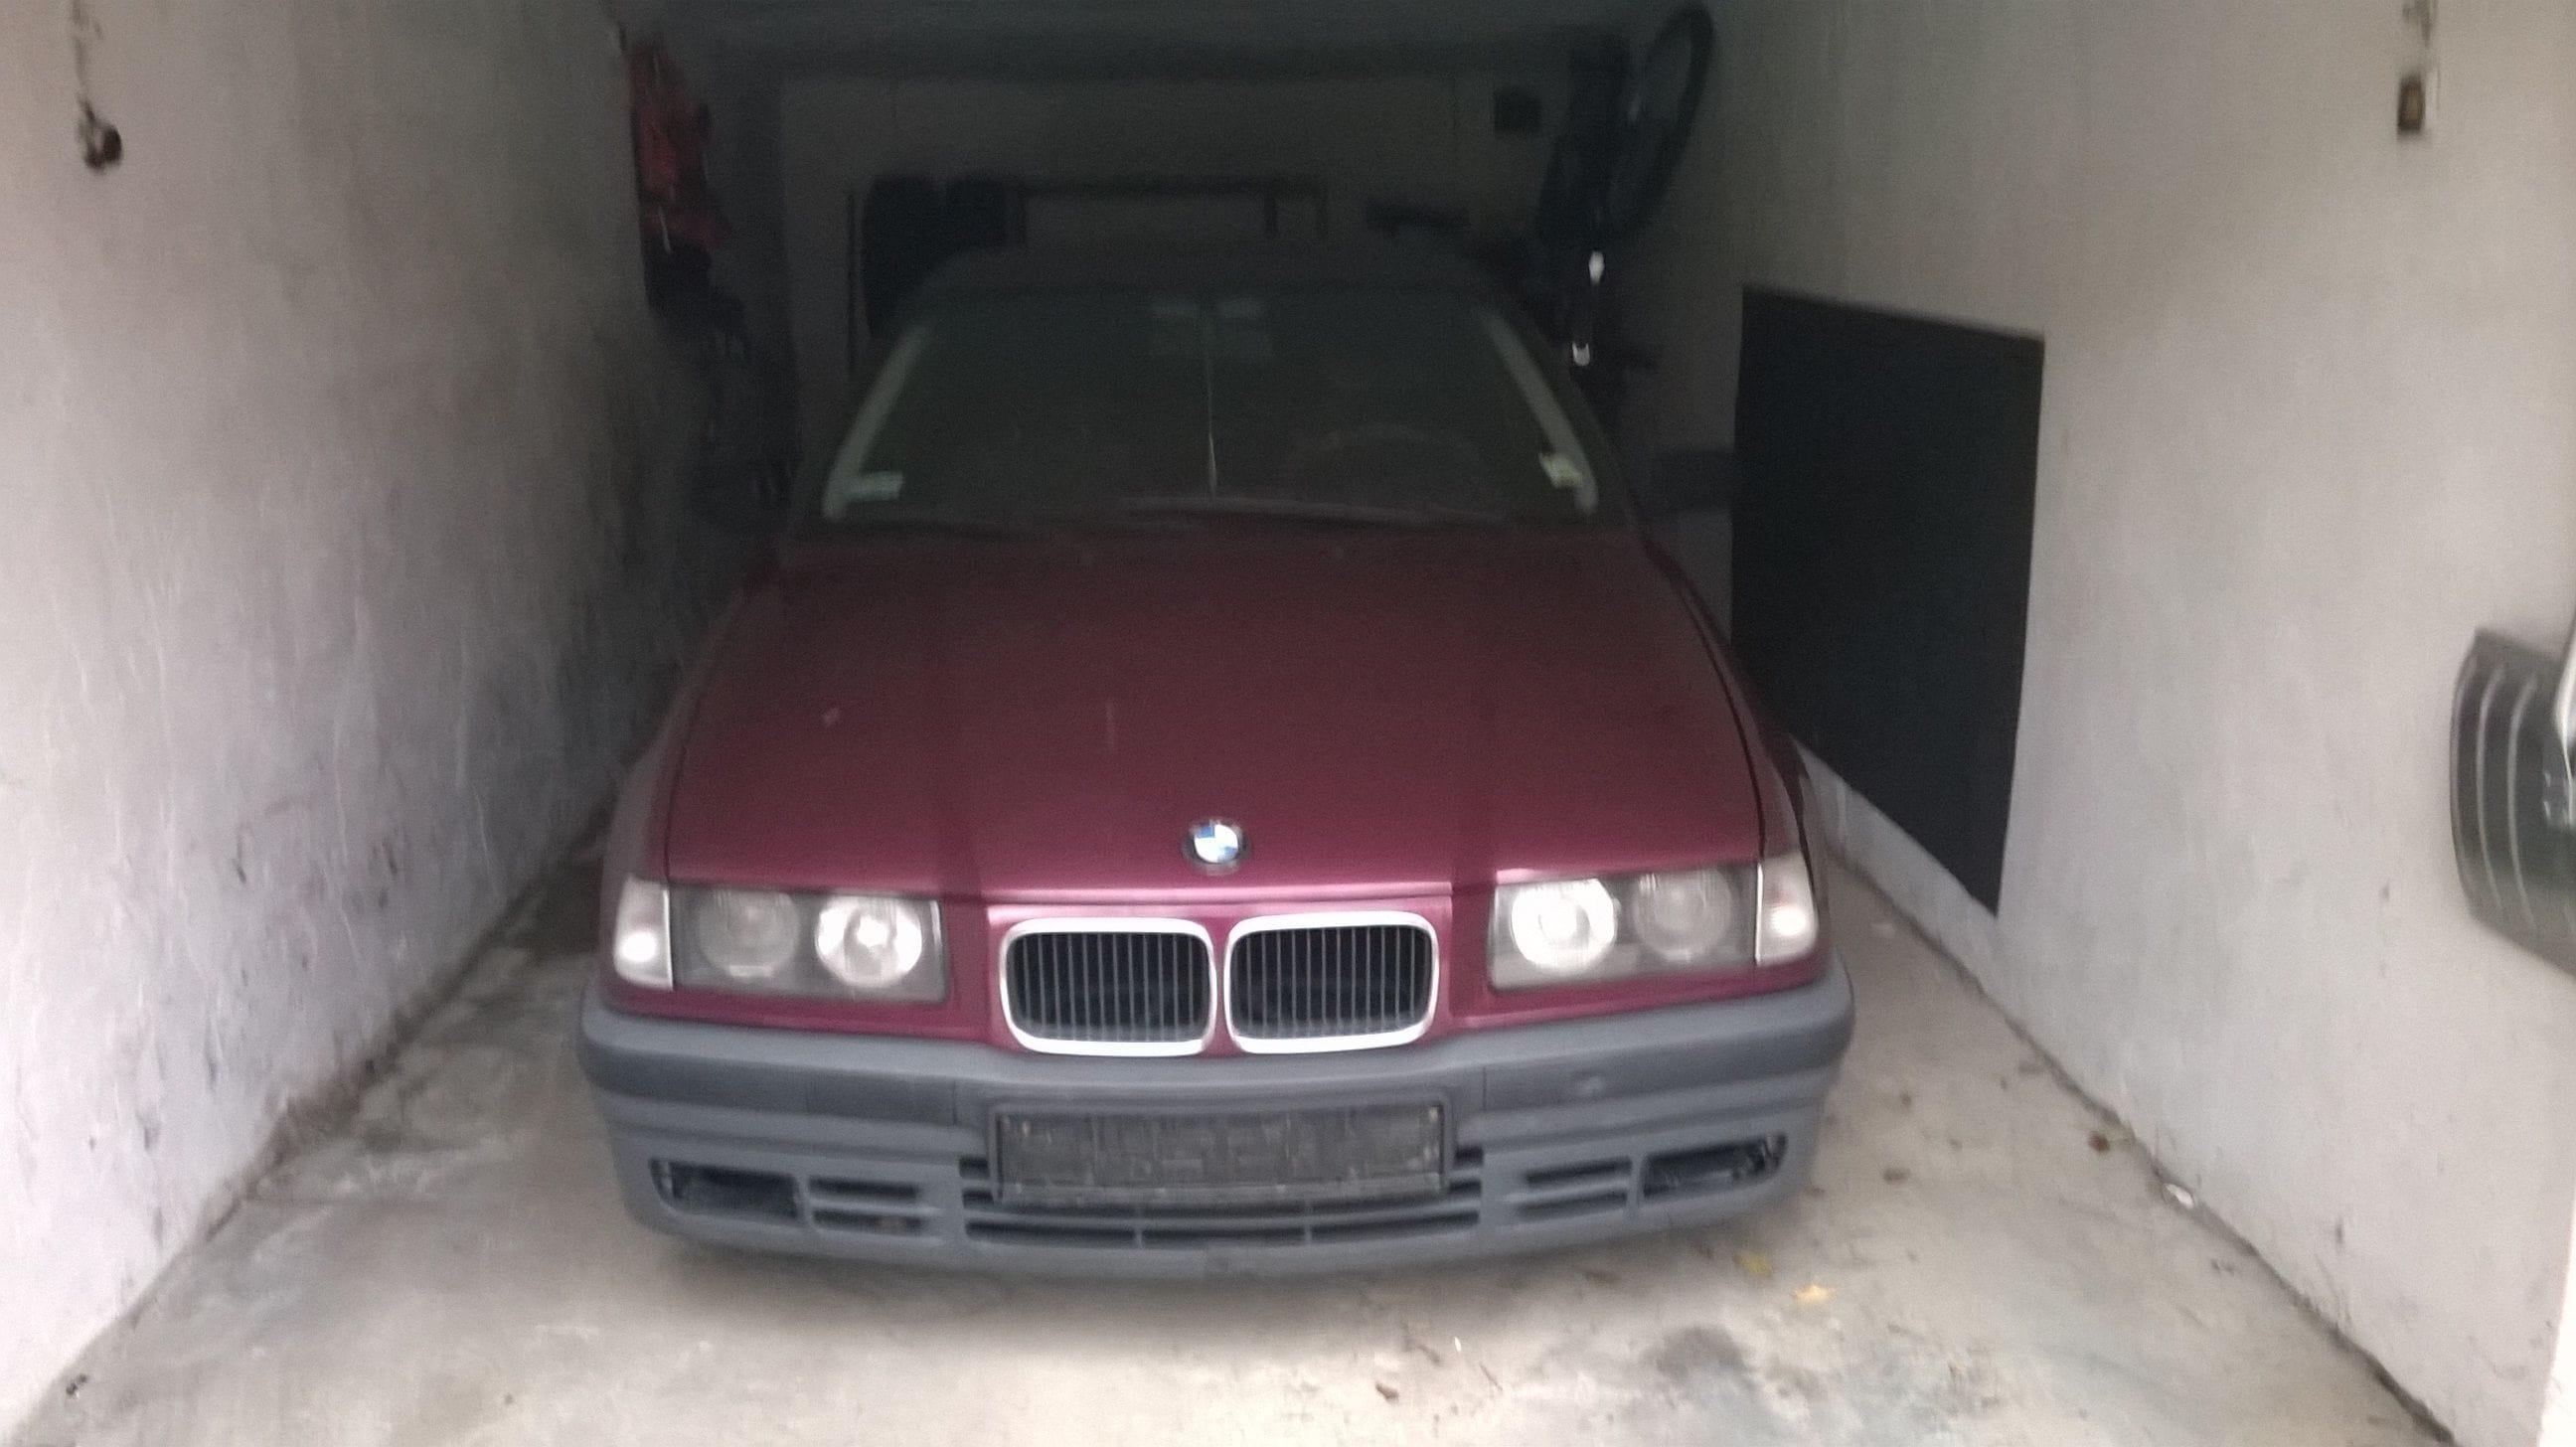 Nowy wóz na podwórku!